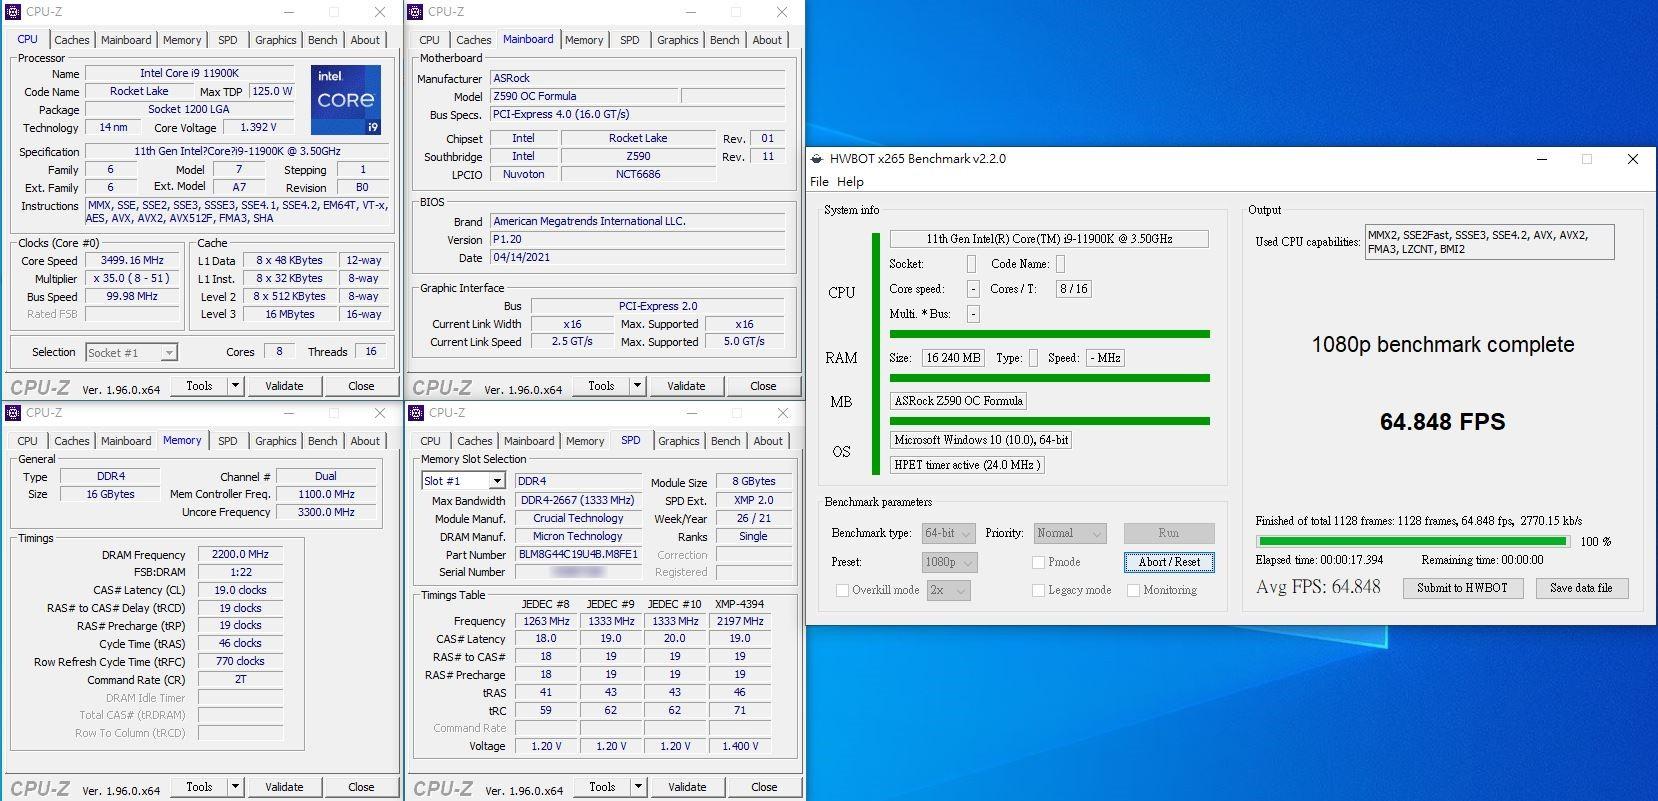 Crucial Ballistix MAX DDR4-4400電競記憶體-輕鬆獲得高頻率效能...227